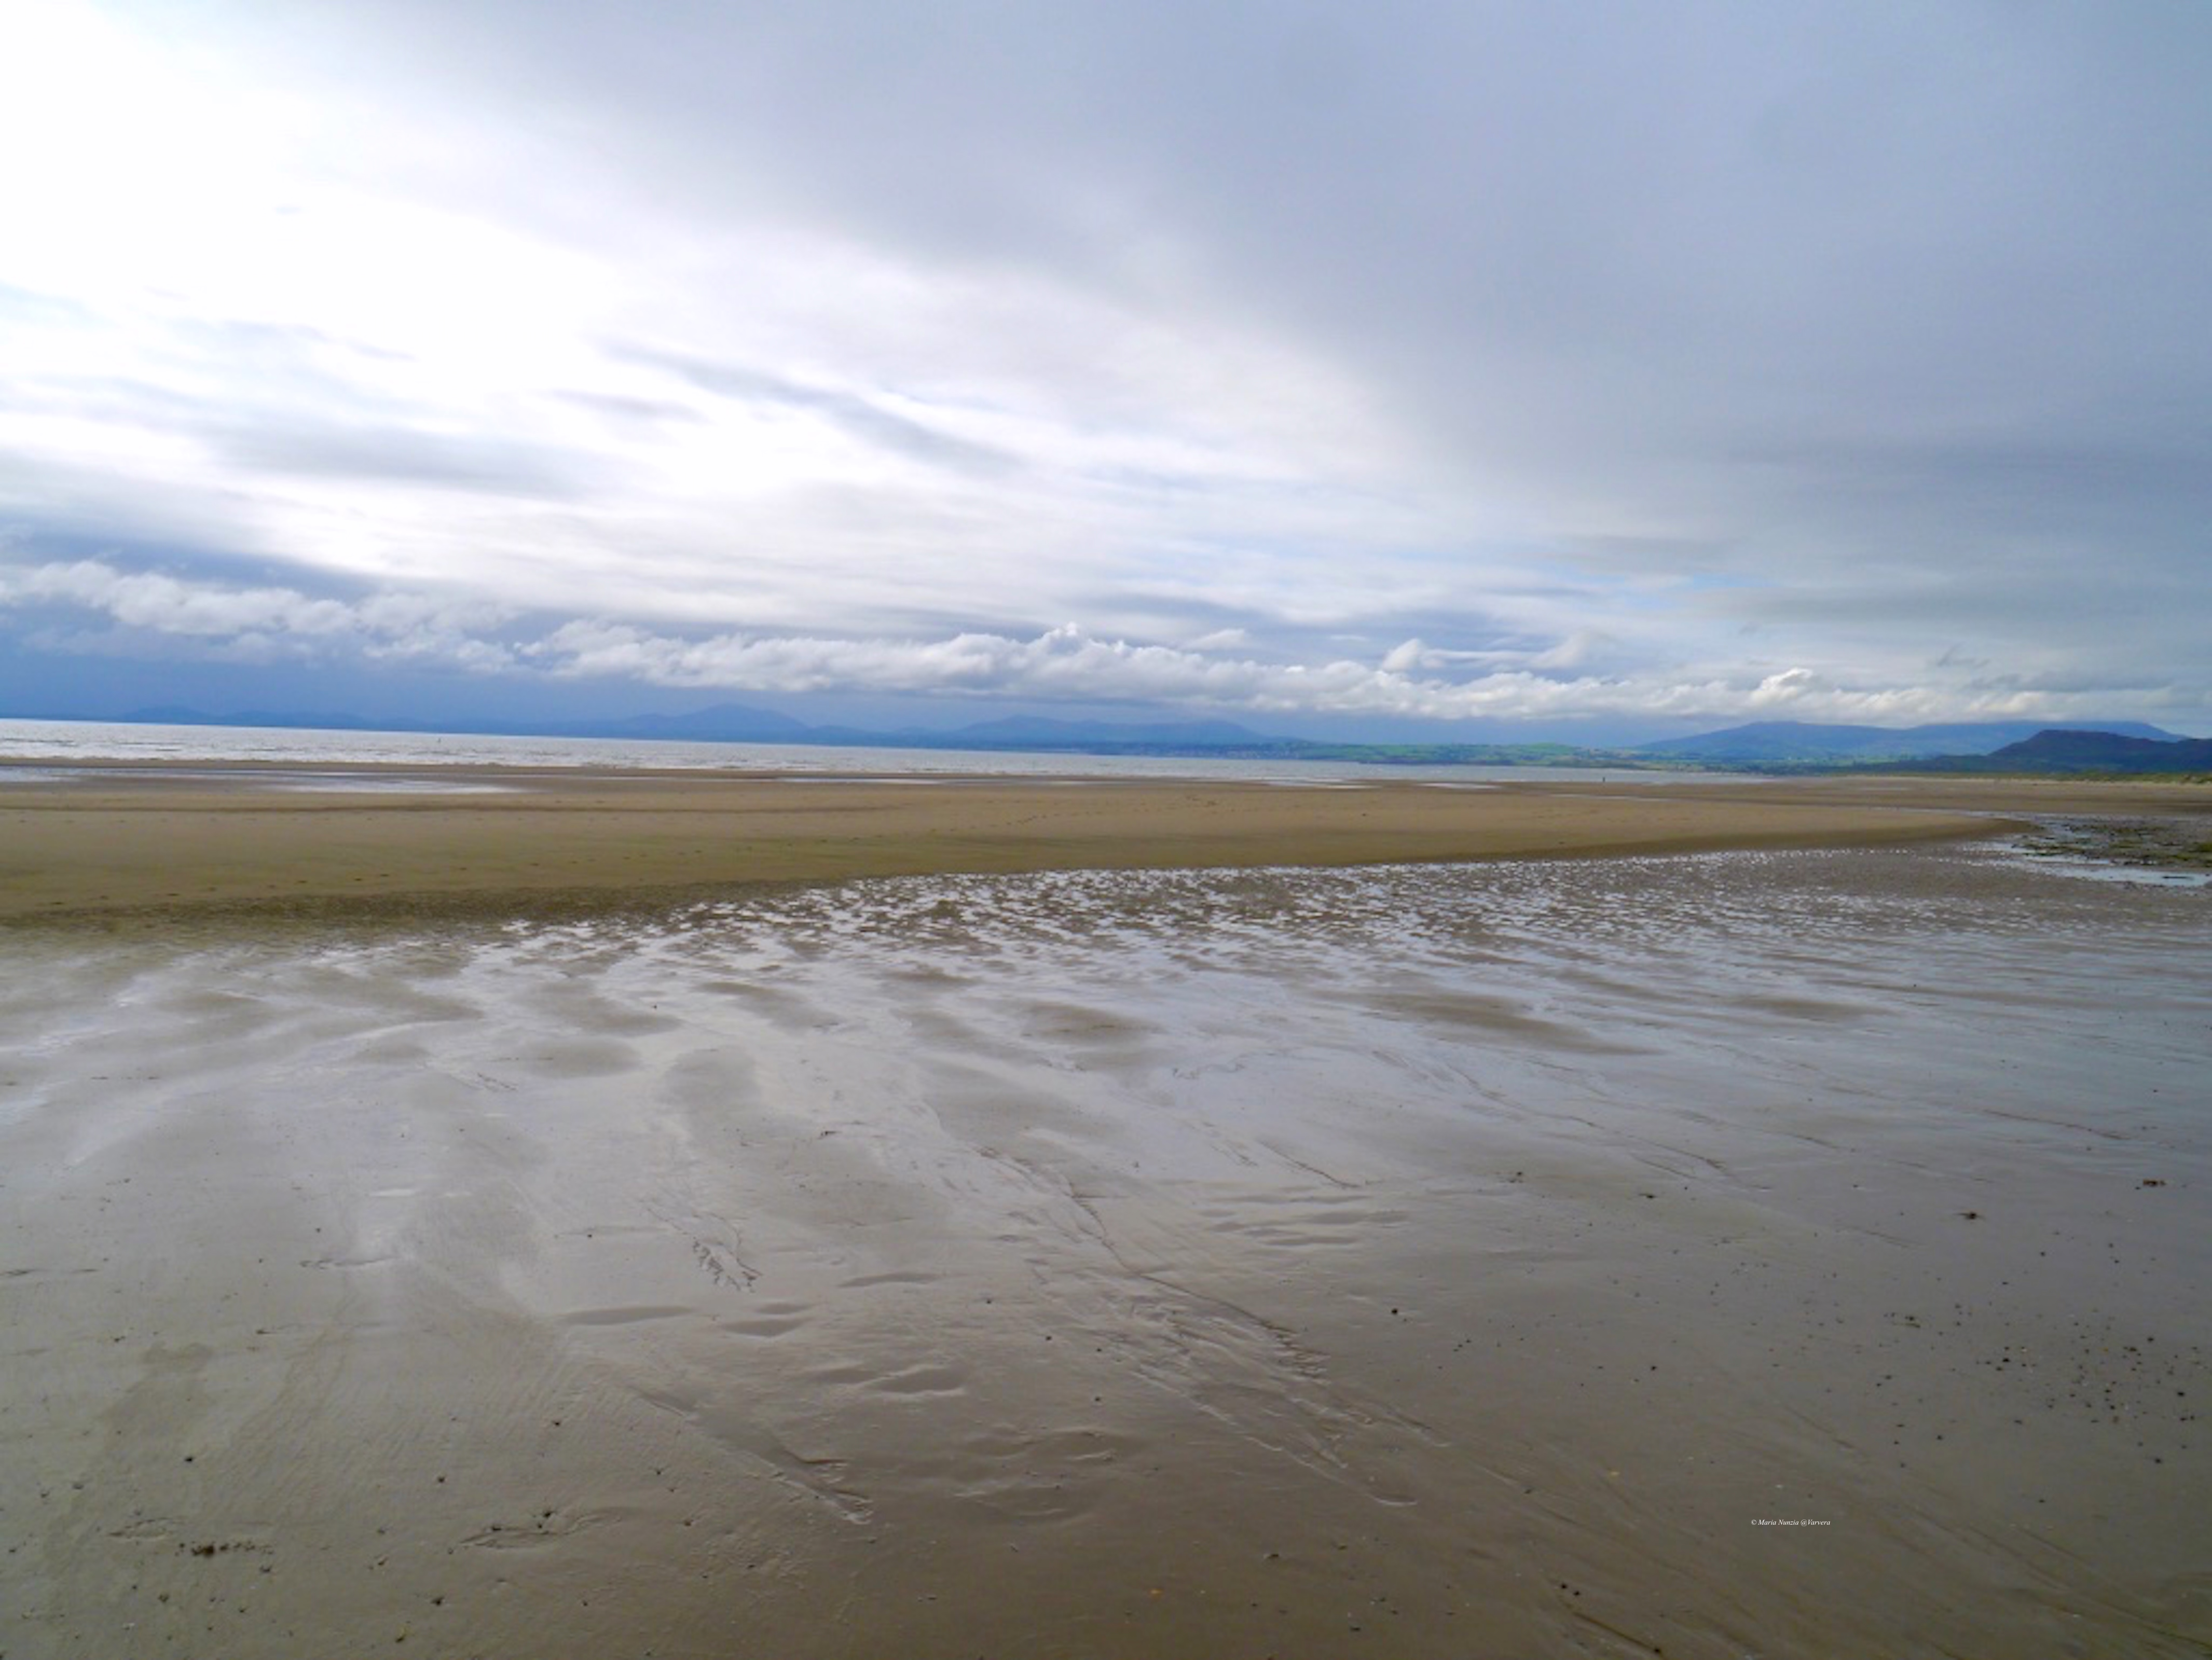 Morfa_Beach_©_Maria_Nunzia__Varvera_P1530379_1024_1024